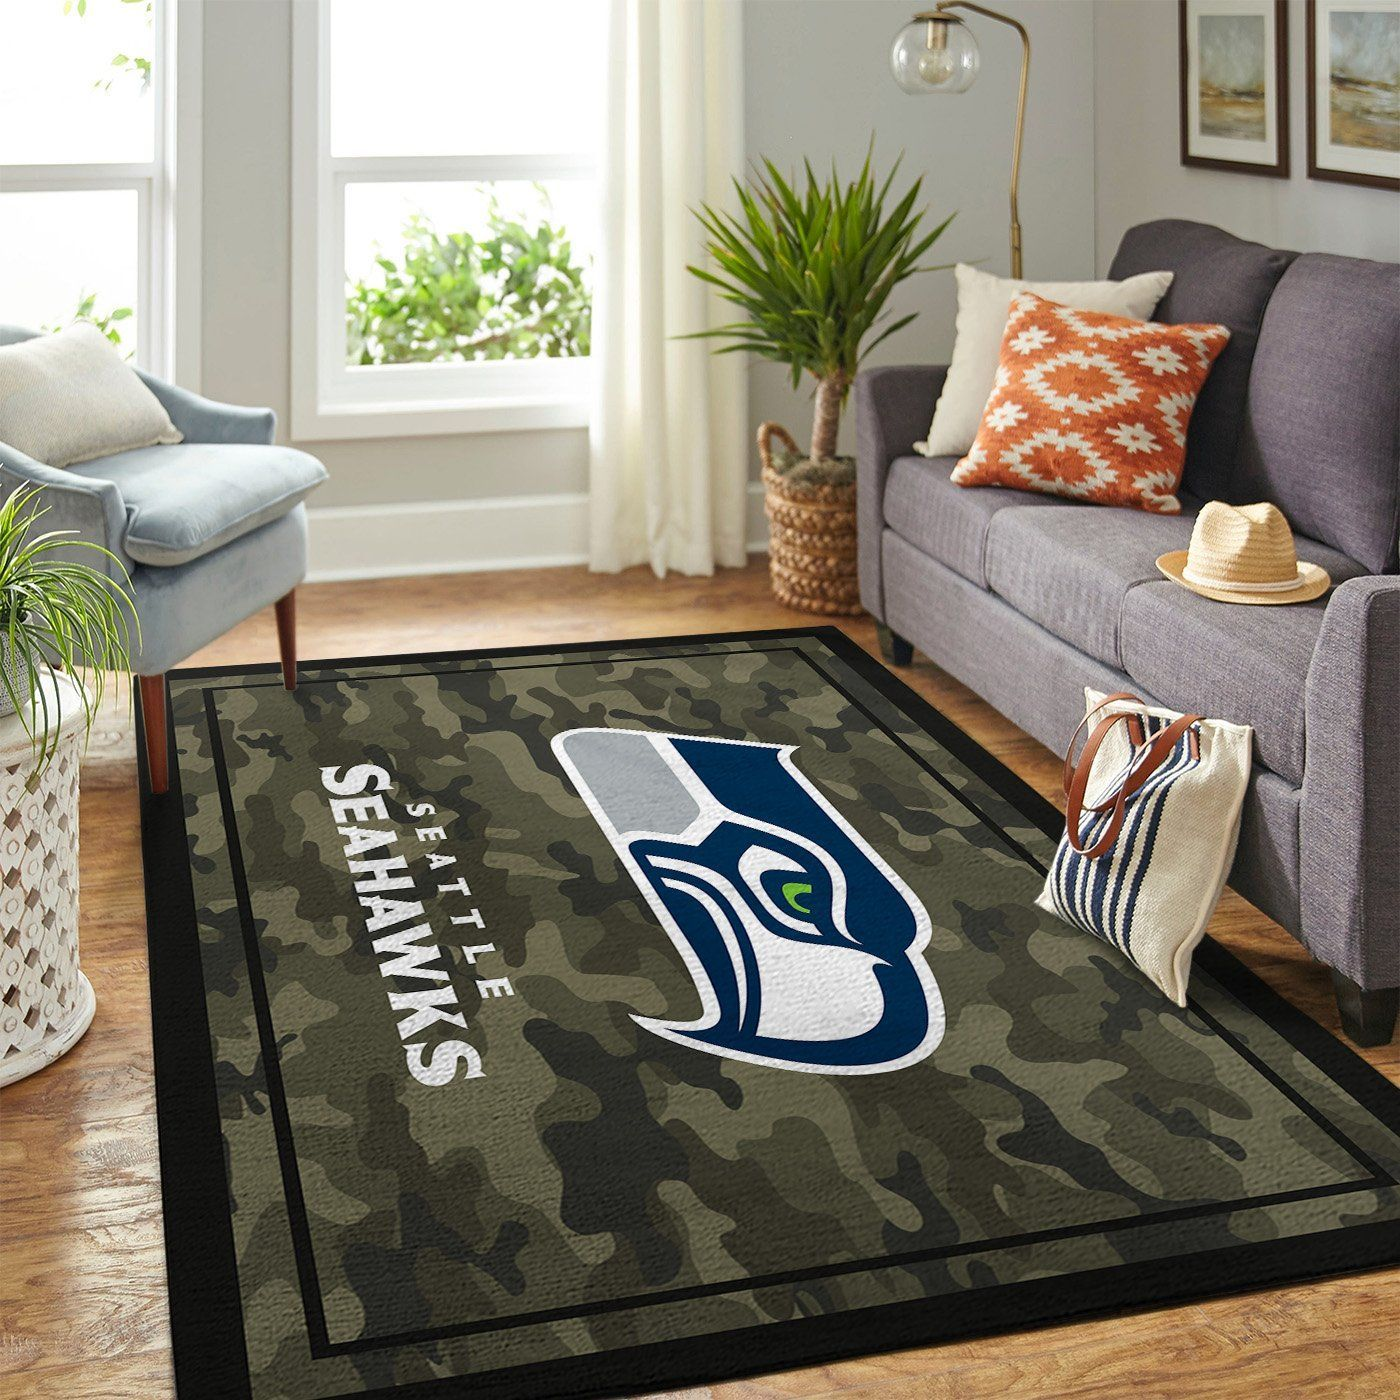 Amazon Seattle Seahawks Living Room Area No4968 Rug